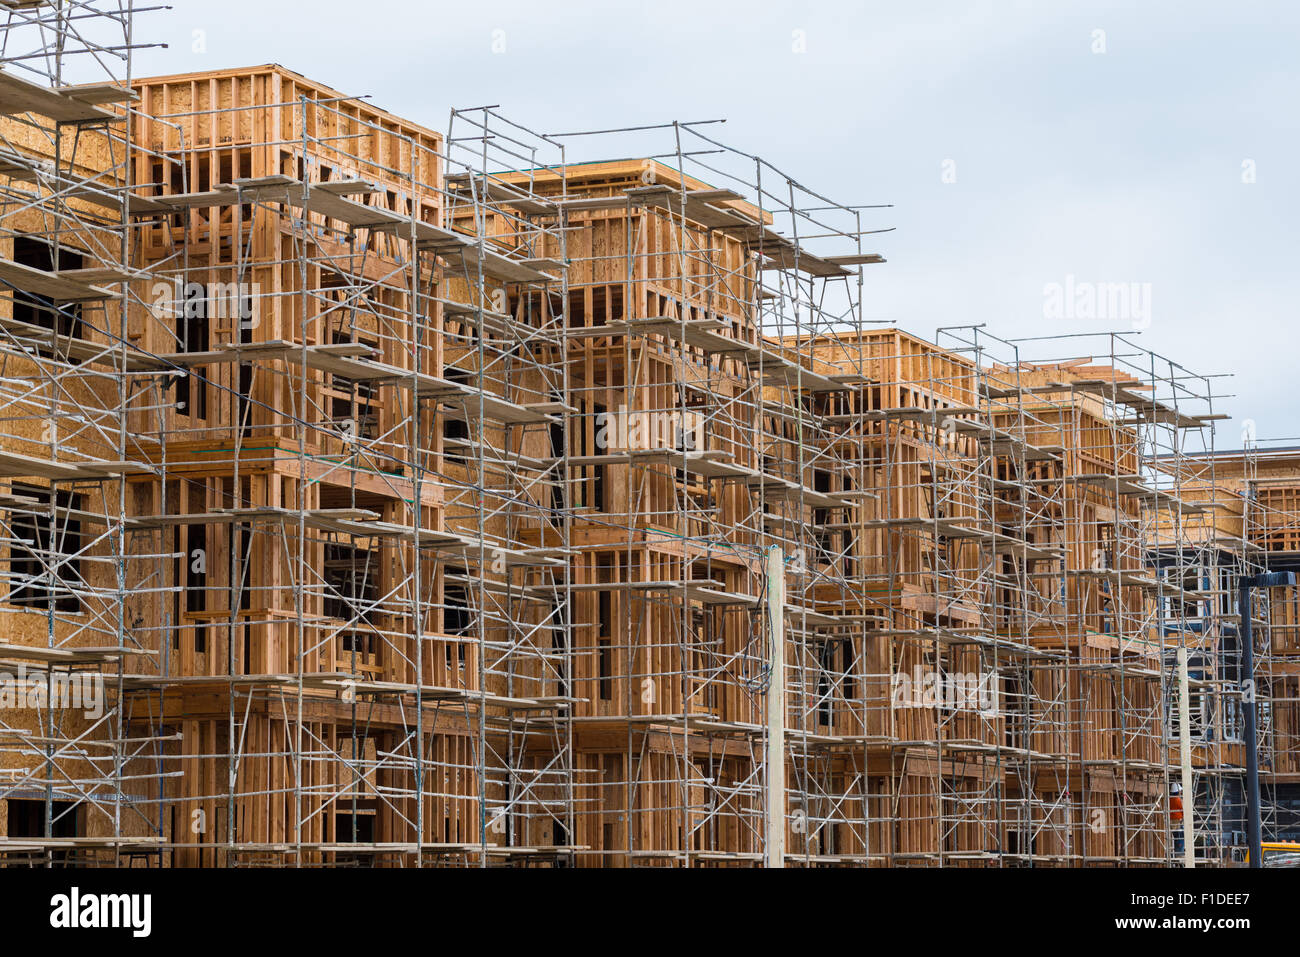 new wood frame apartment or condominium construction stock photo